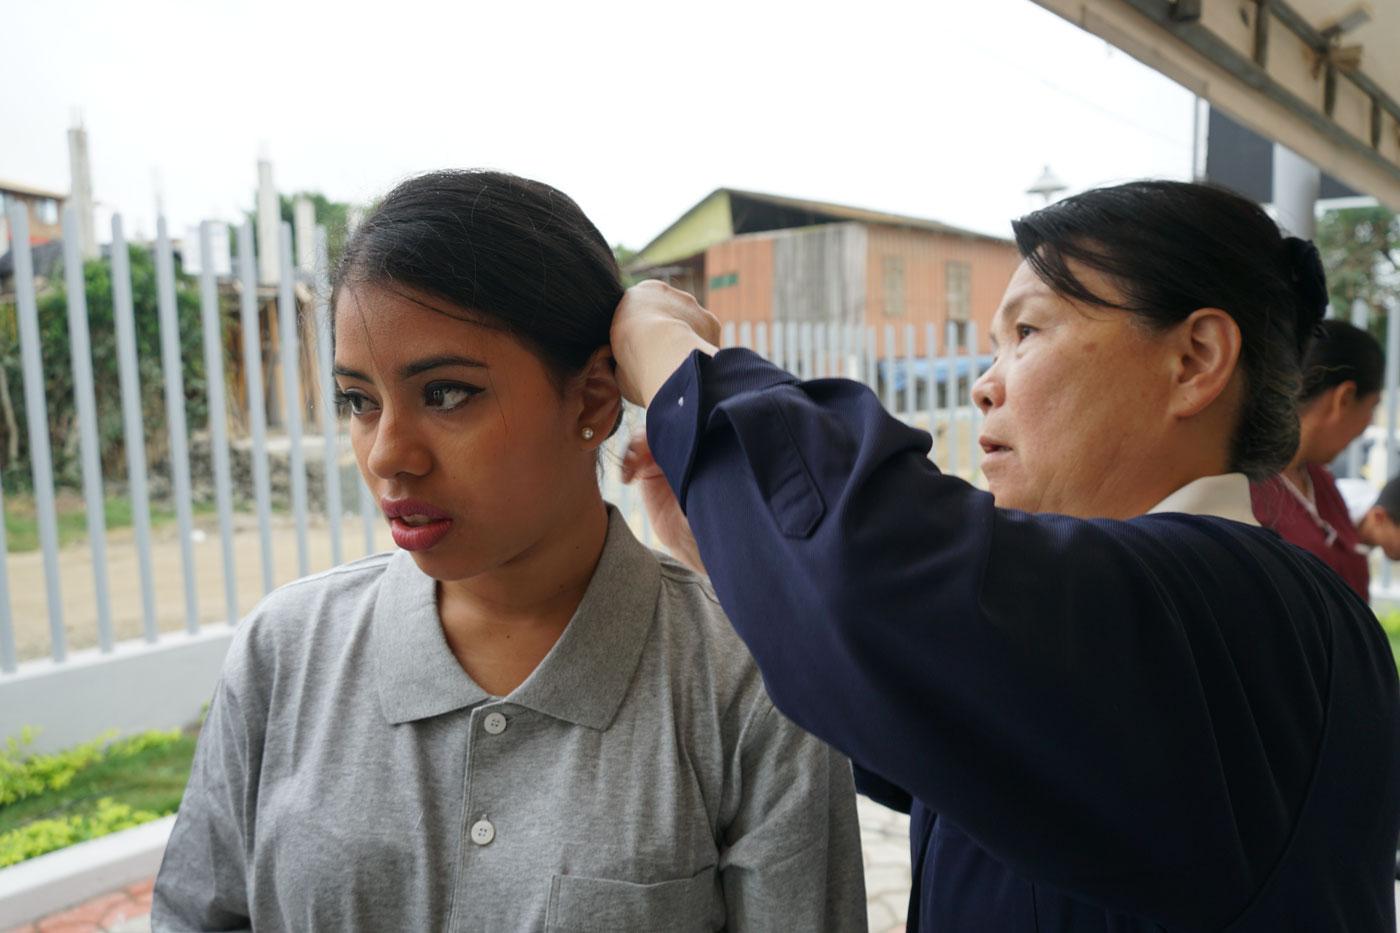 TzuChiUSA_Canoa-volunteer-training_DSC00721